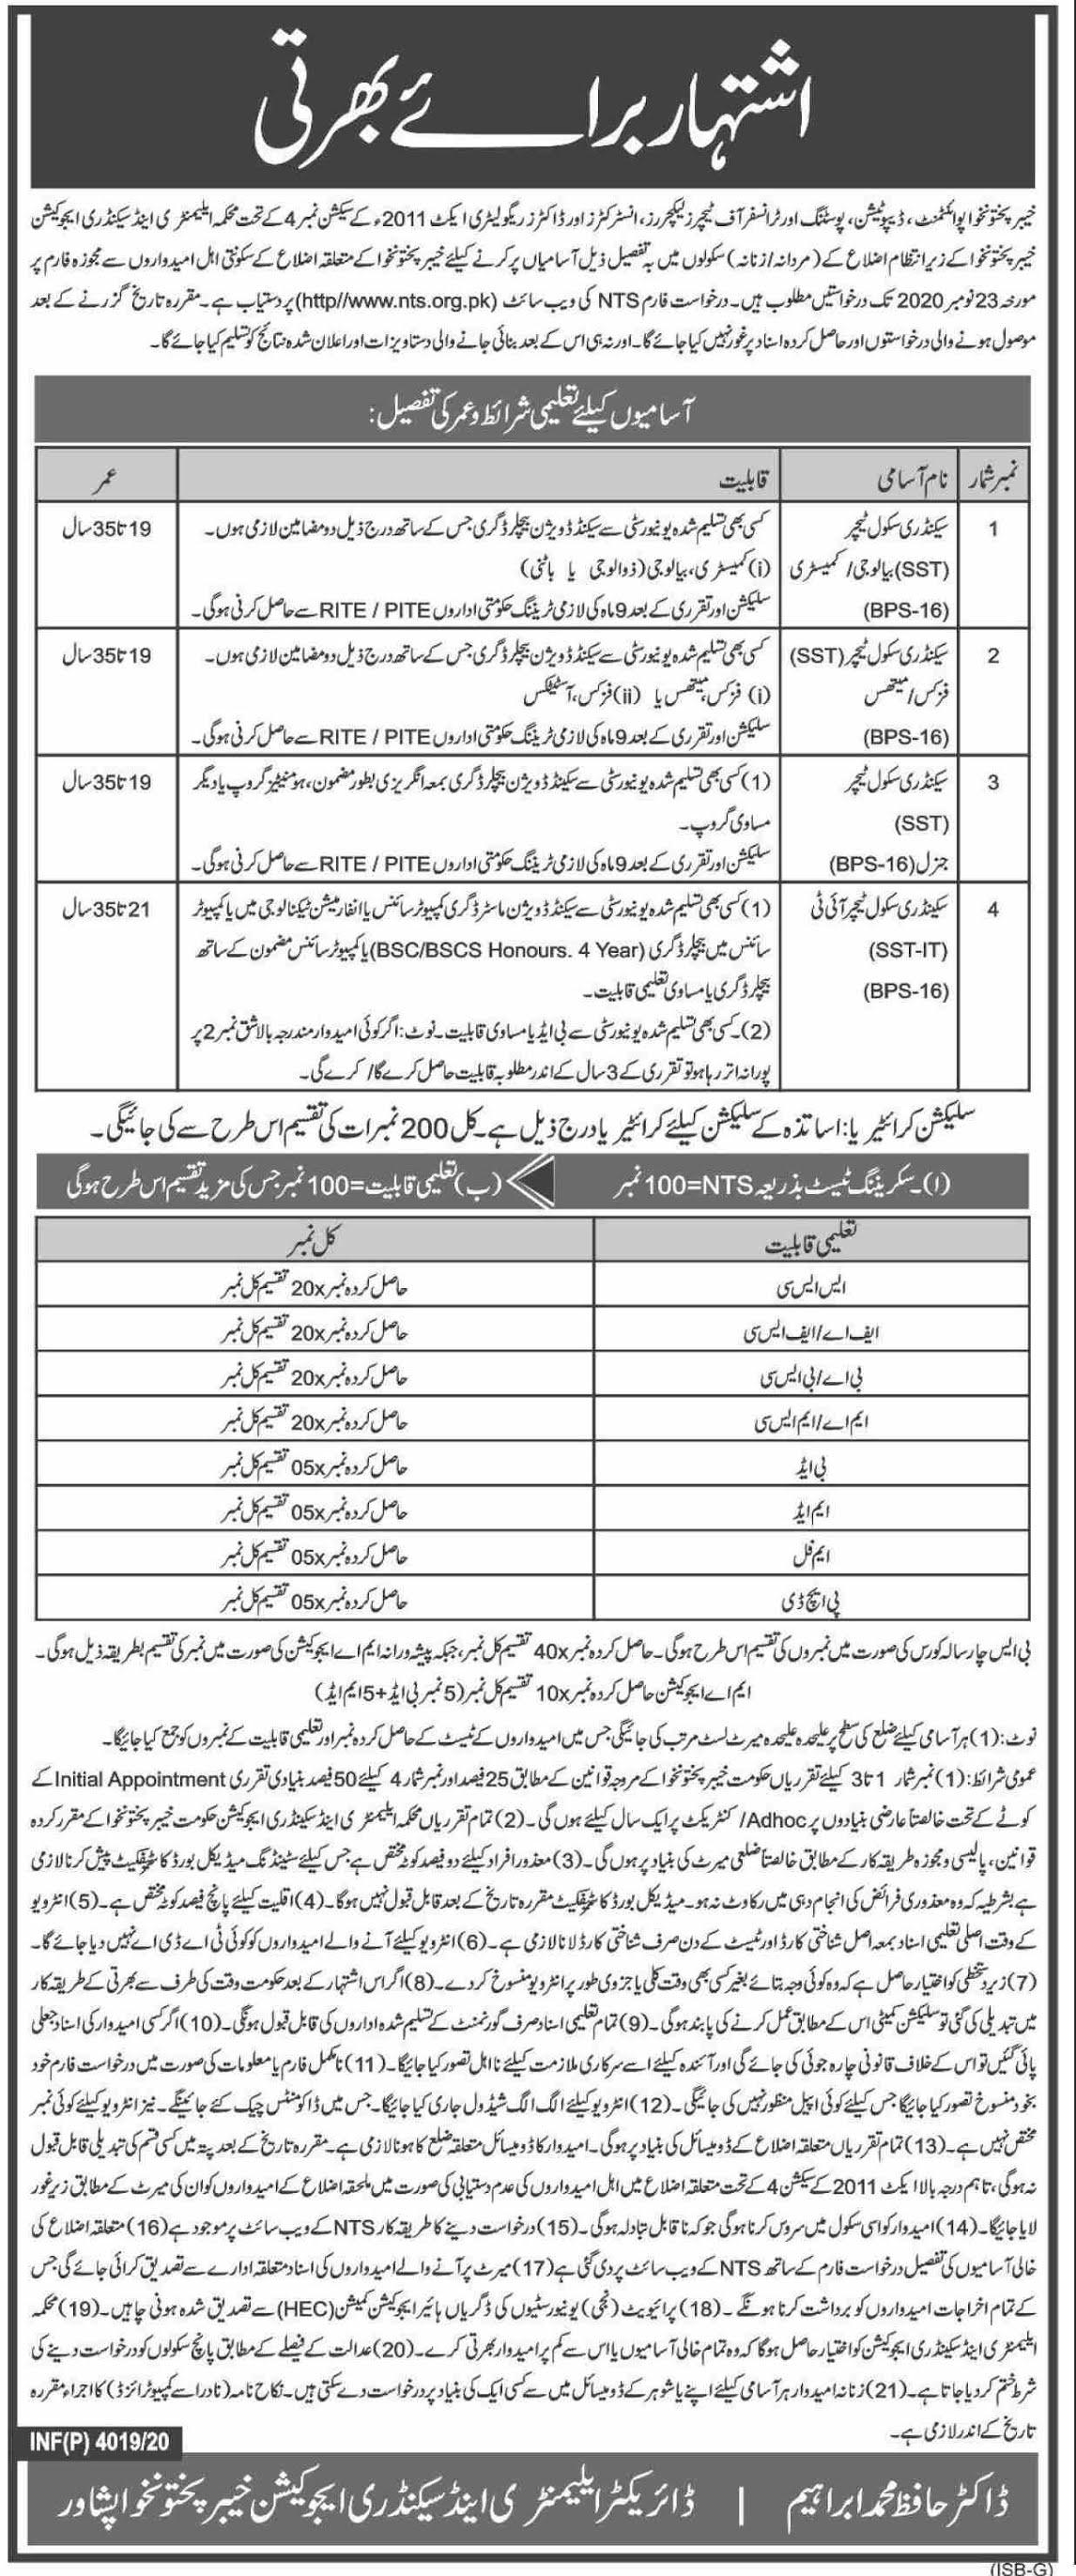 Elementary & Secondary Education Department Latest Jobs in Pakistan Jobs 2021 - Online Apply - www.nts.org.pk